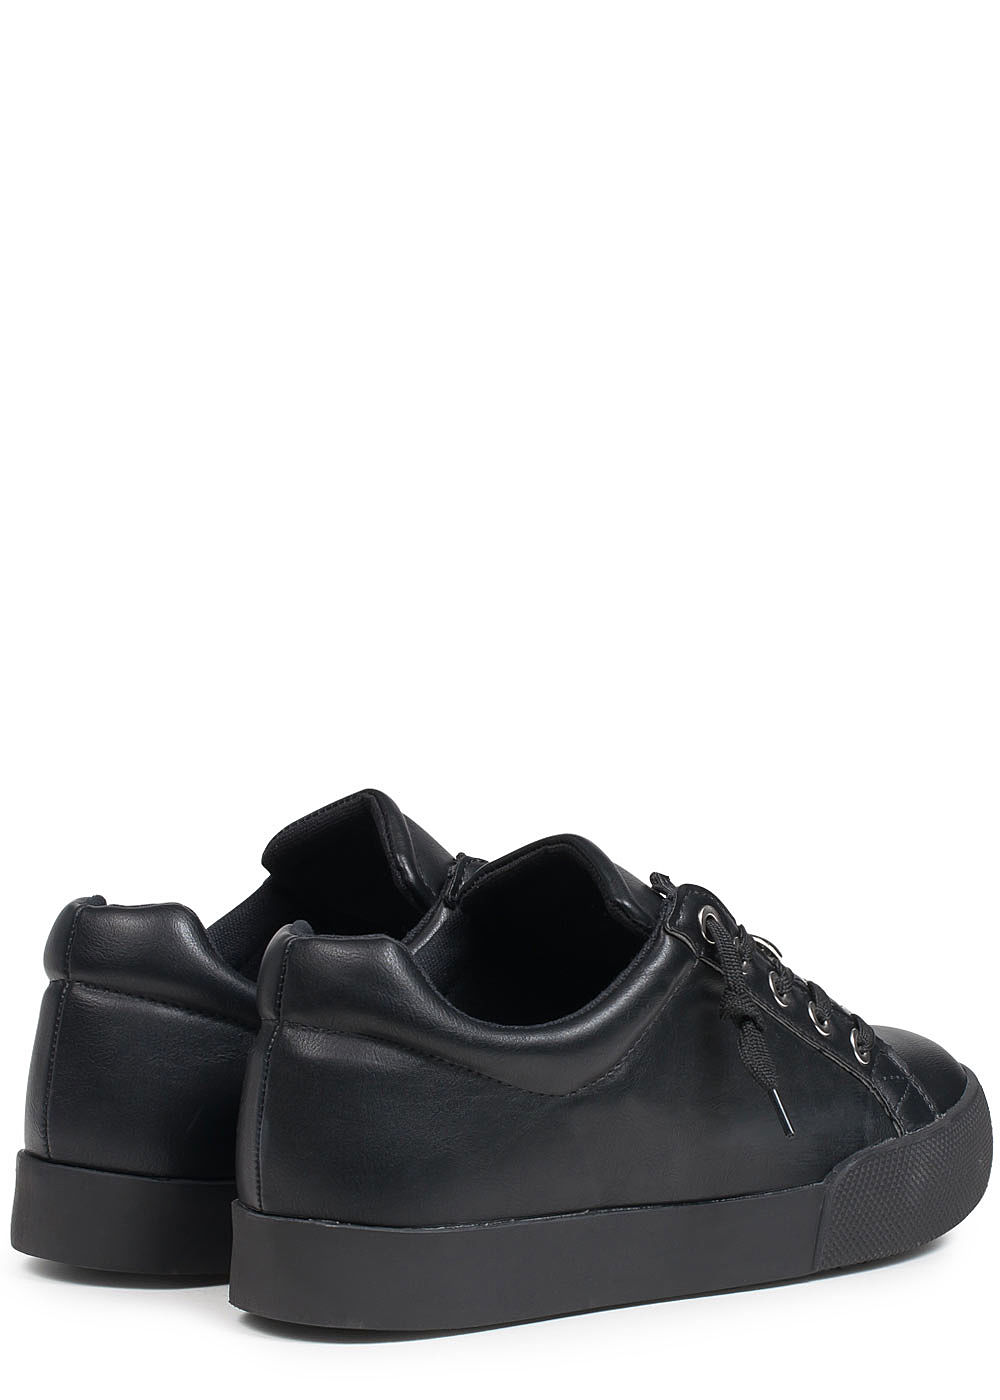 seventyseven lifestyle schuh damen sneaker zum binden deko zipper oben schwarz 77onlineshop. Black Bedroom Furniture Sets. Home Design Ideas